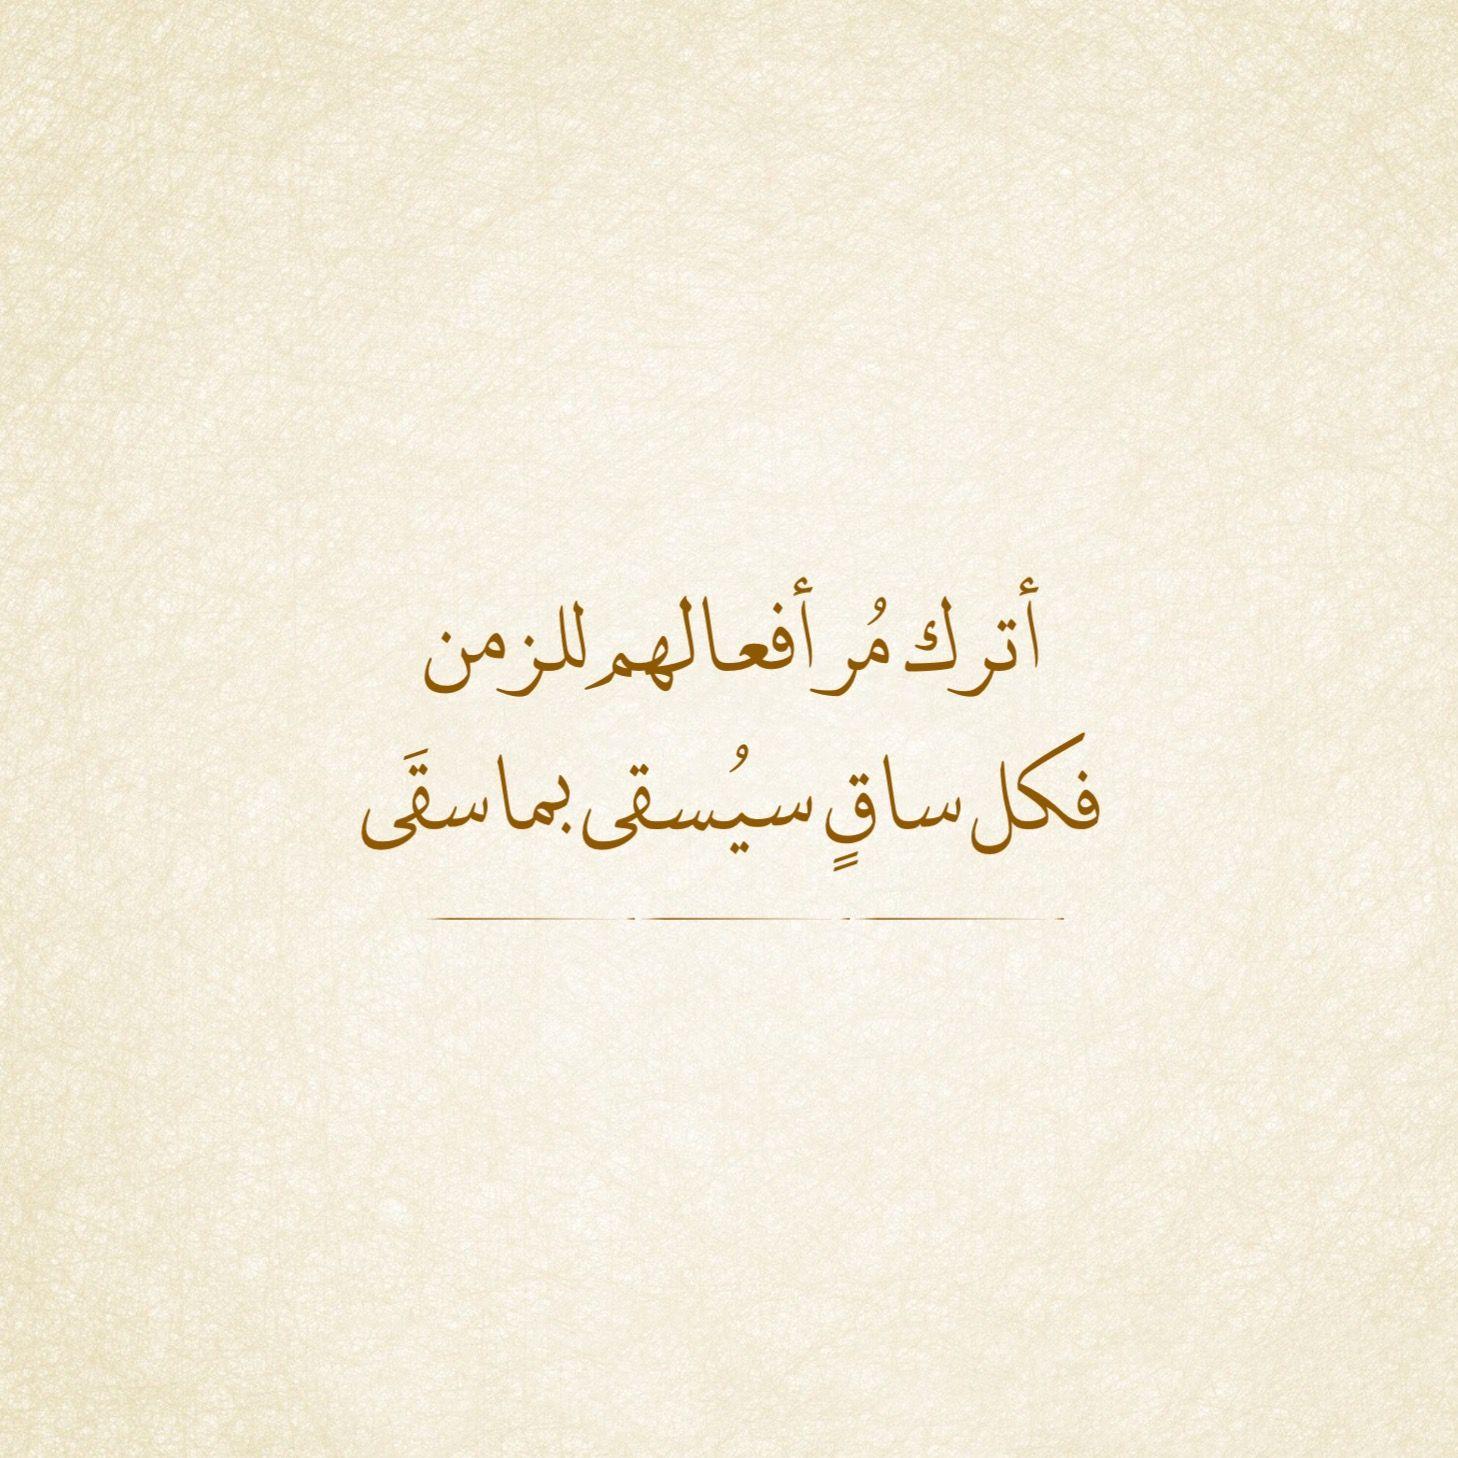 كل ساق سيسقى بما سقى Arabic Quotes Arabic Words Quotes